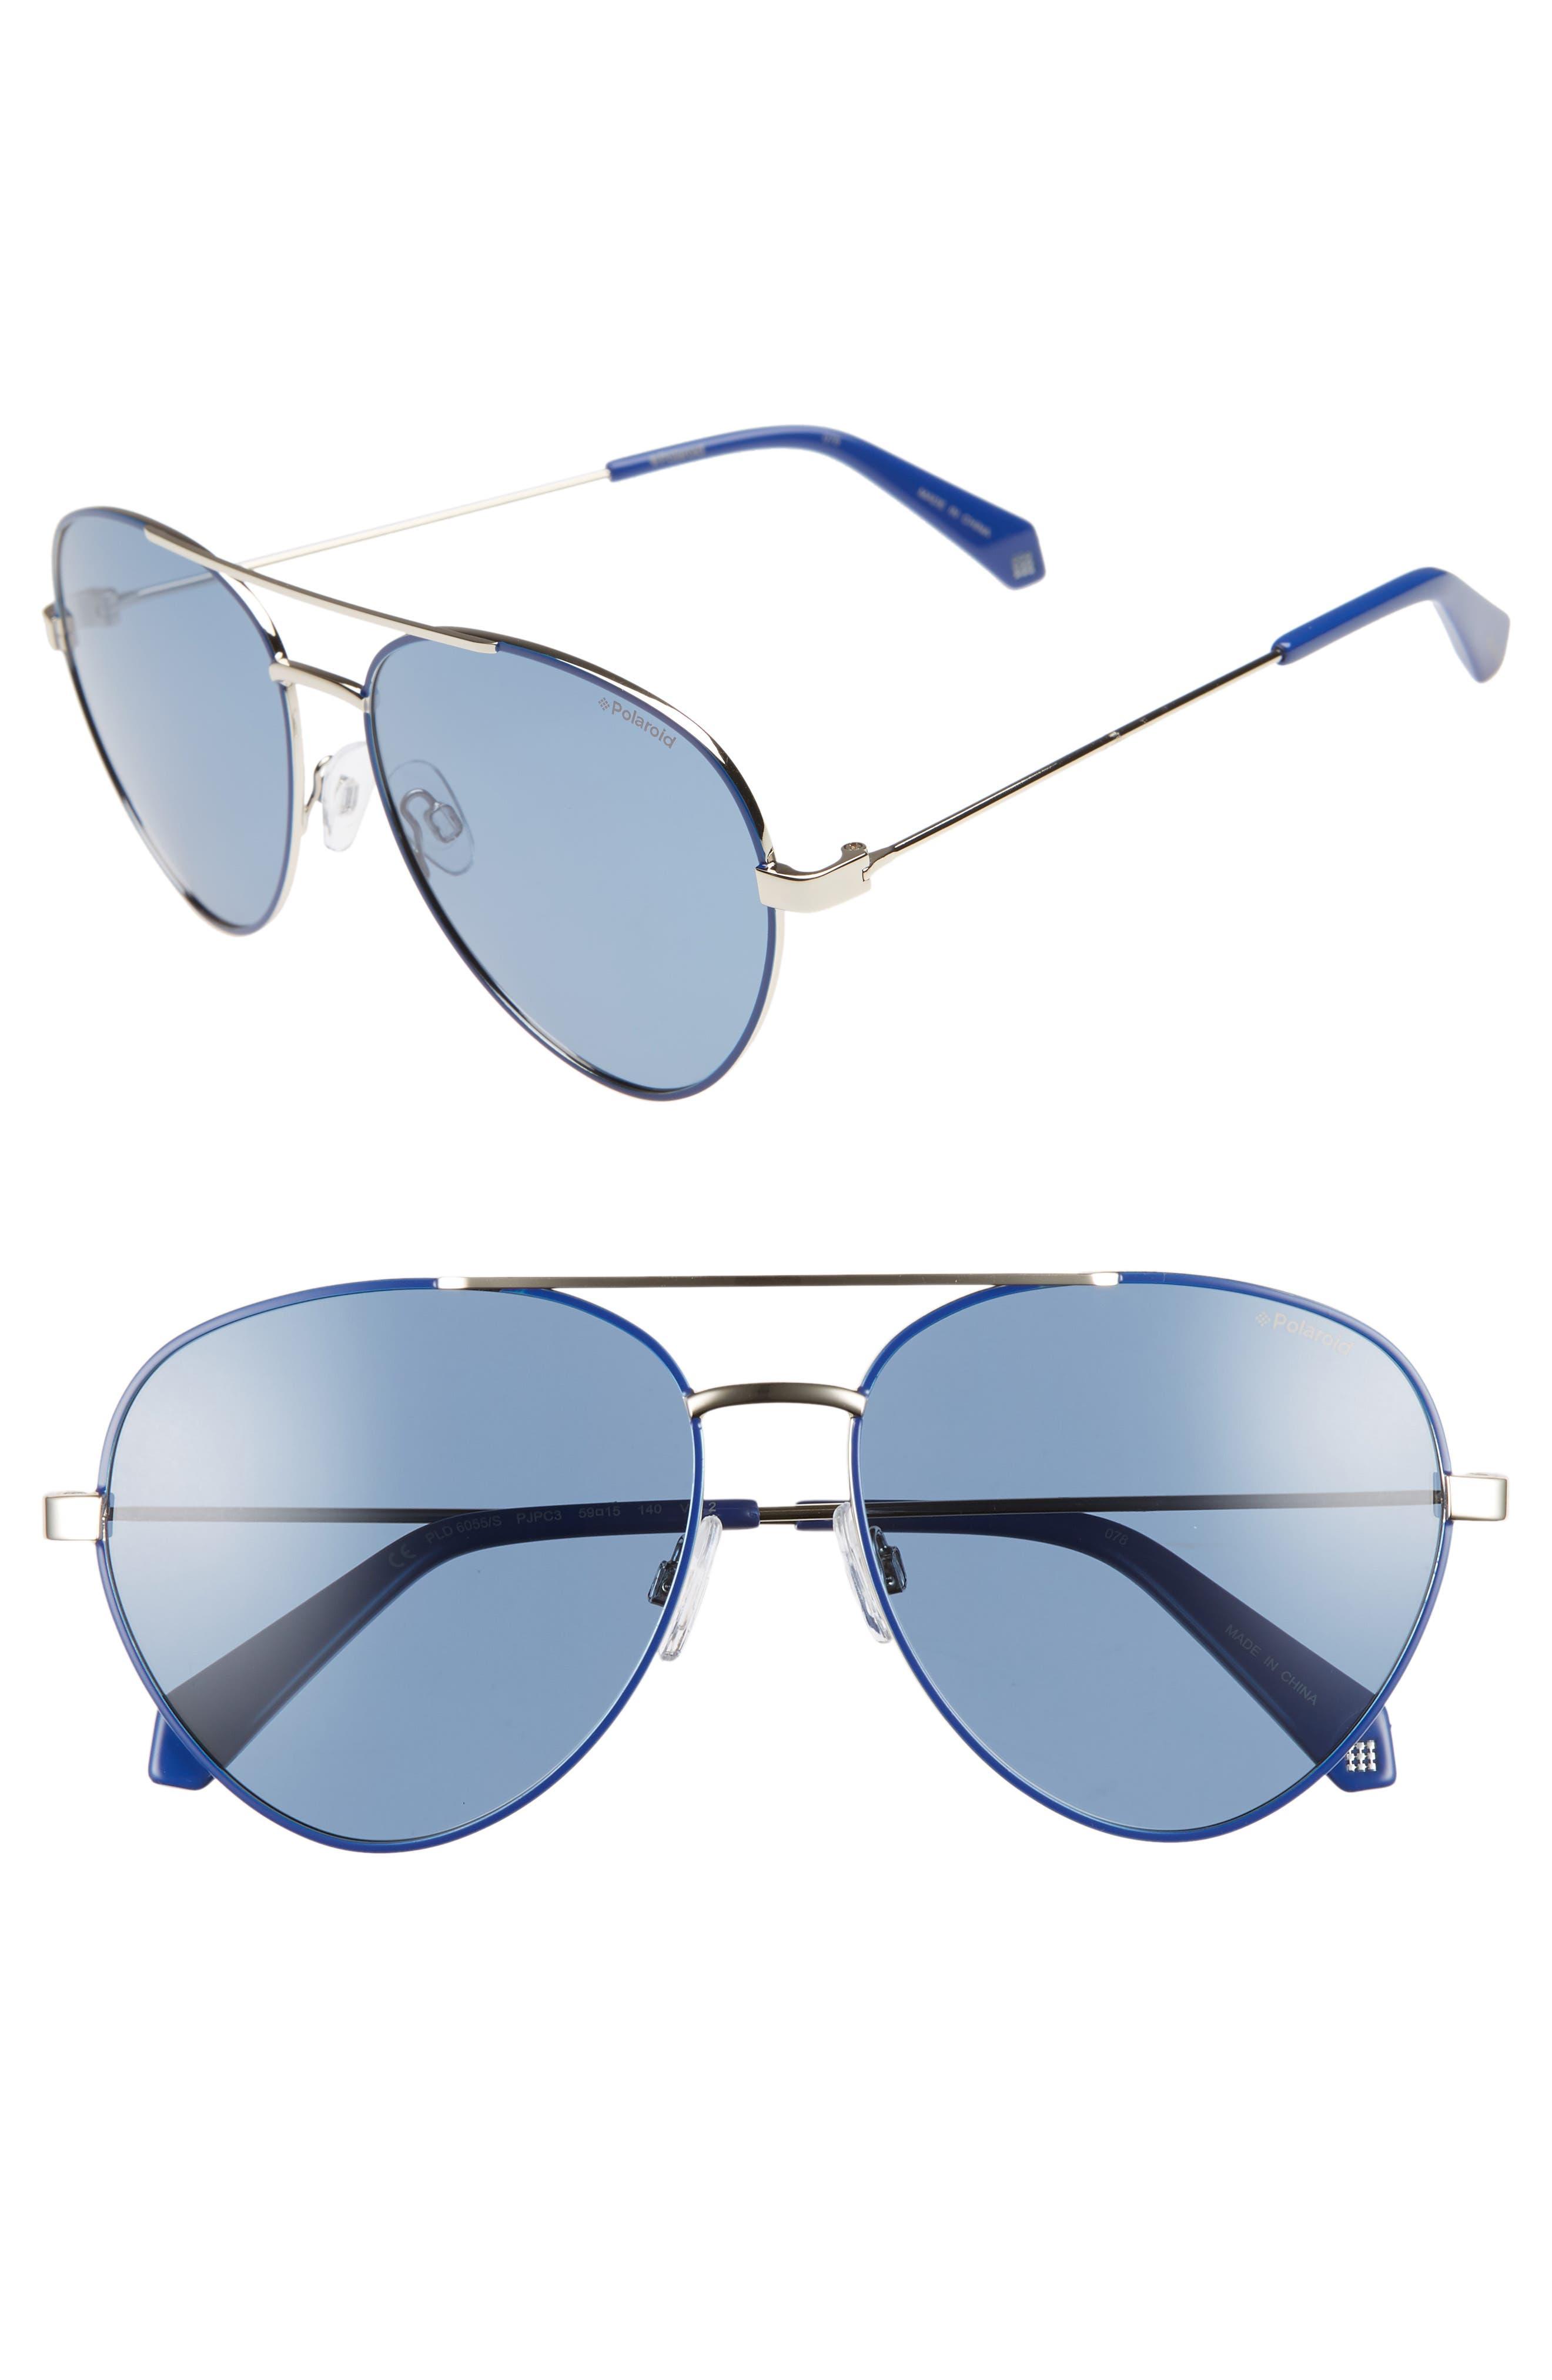 Polaroid 5m Polarized Aviator Sunglasses - Blue